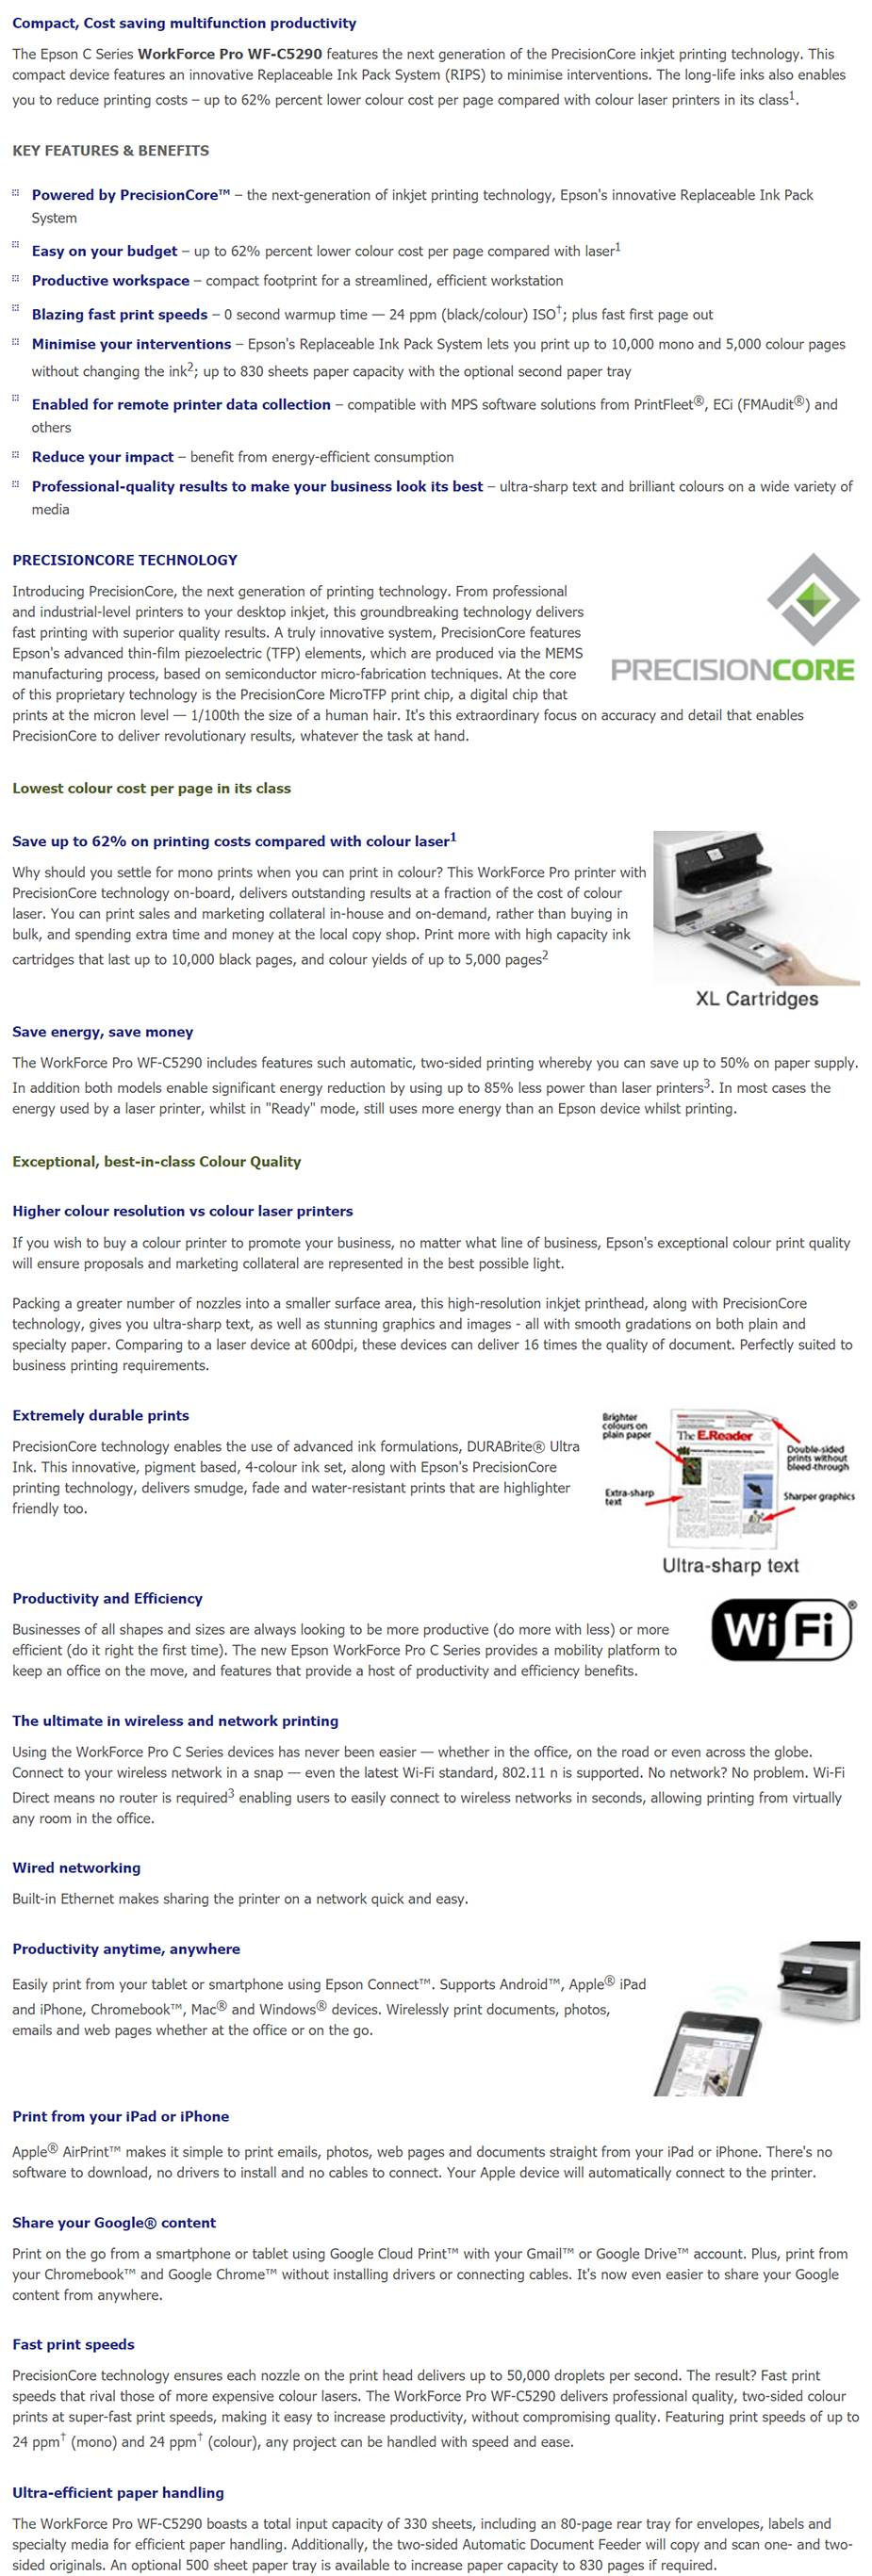 Epson WorkForce Pro WF-C5290 A4 Colour Wireless Inkjet